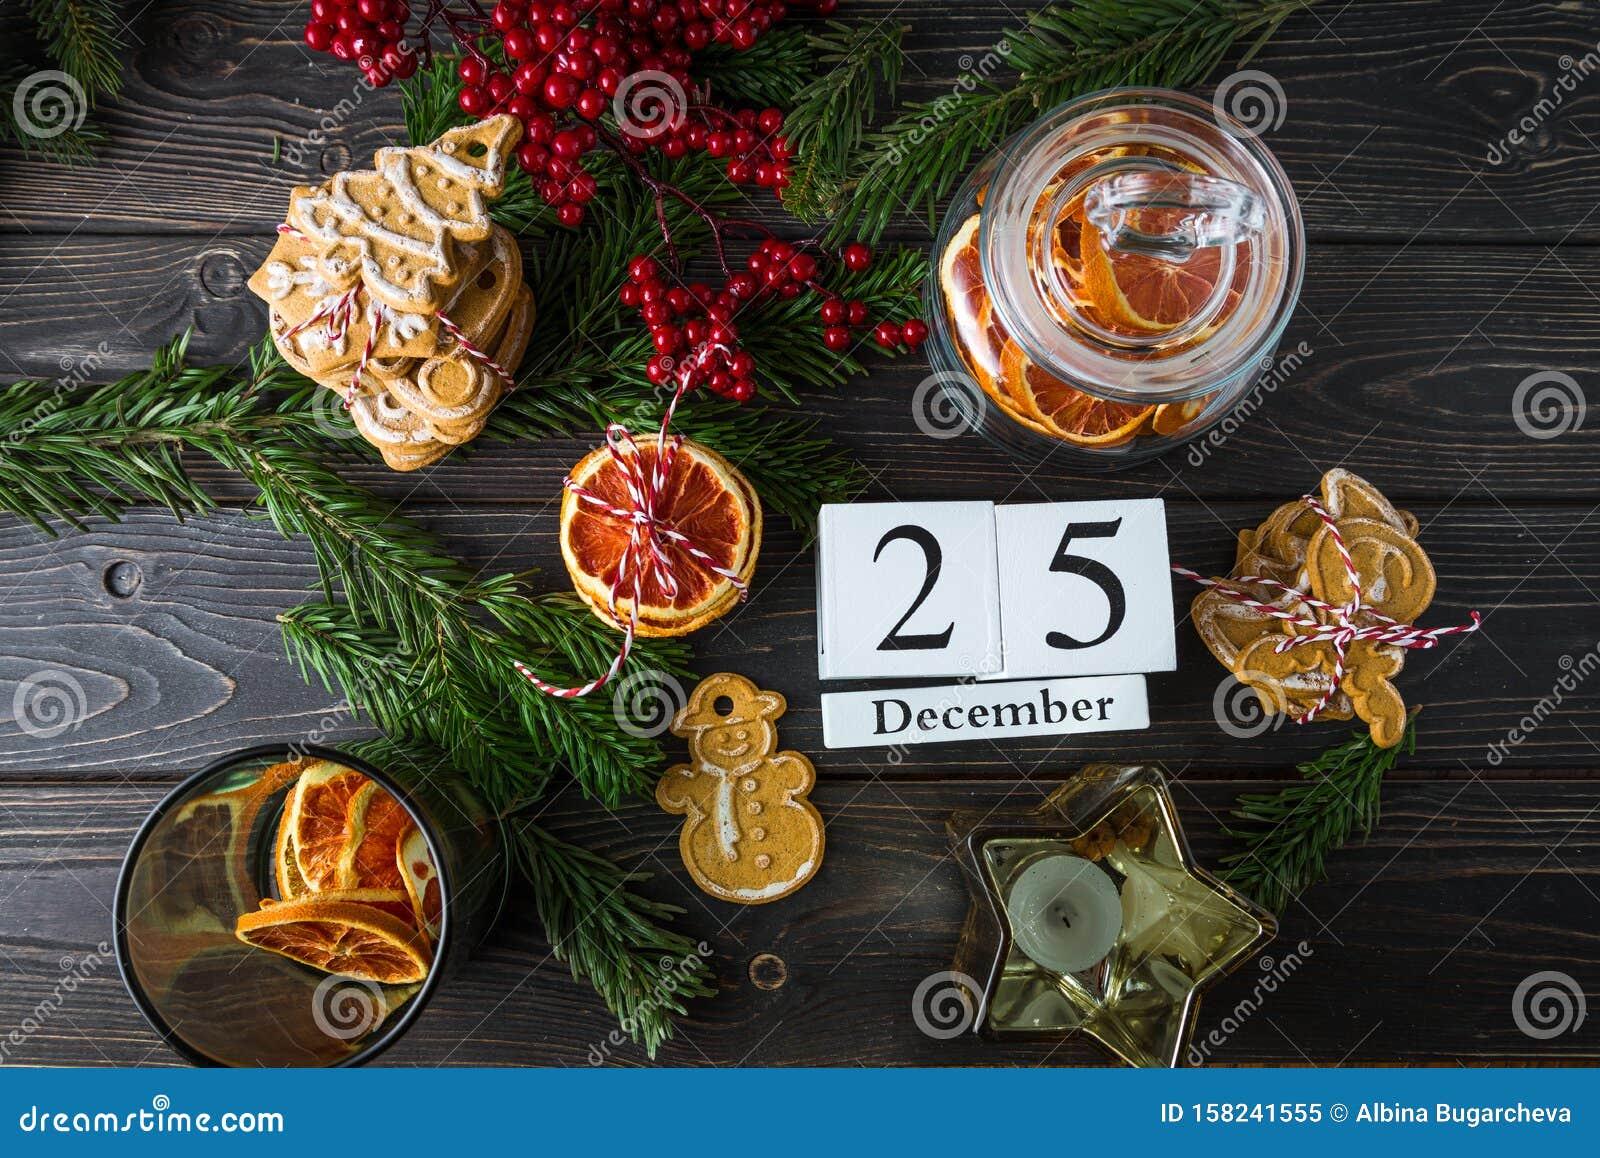 Wooden Calendar With Date 25 December Christmas Decor Orange